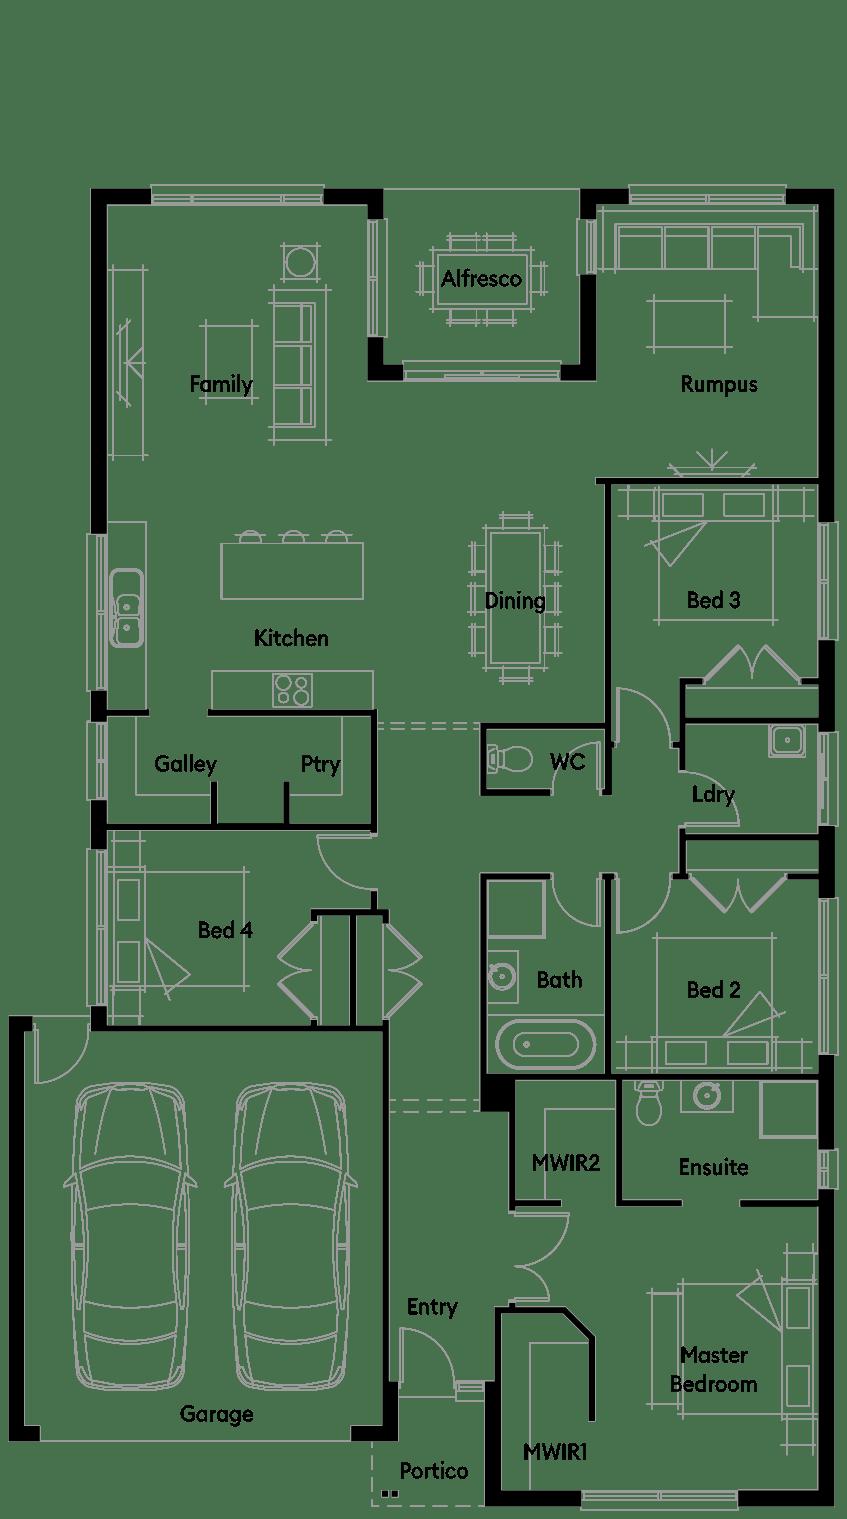 FloorPlan1_HOUSE761_Liverpool_25-8